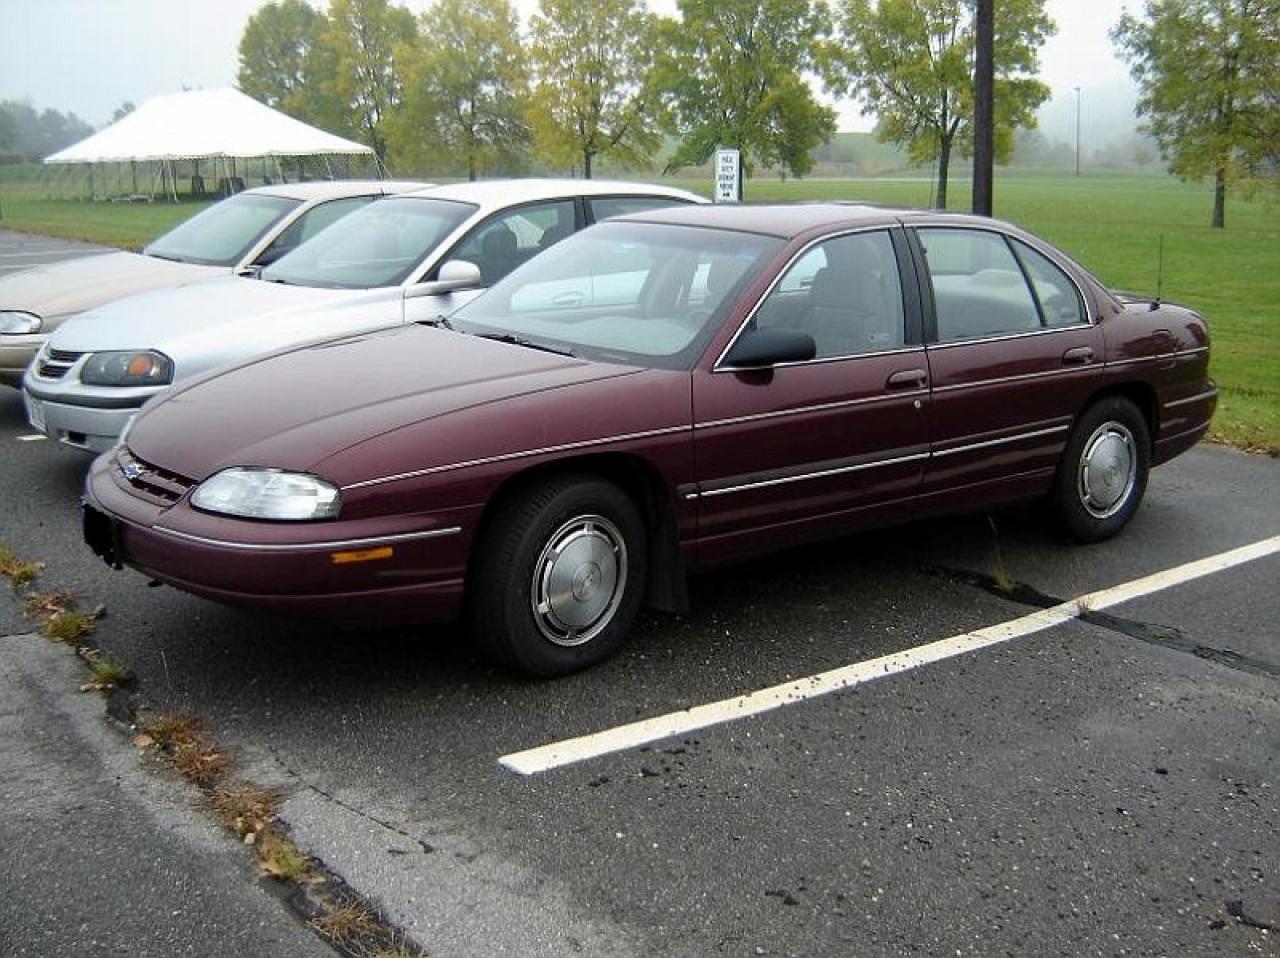 800 1024 1280 1600 origin 1999 Chevrolet Lumina ...